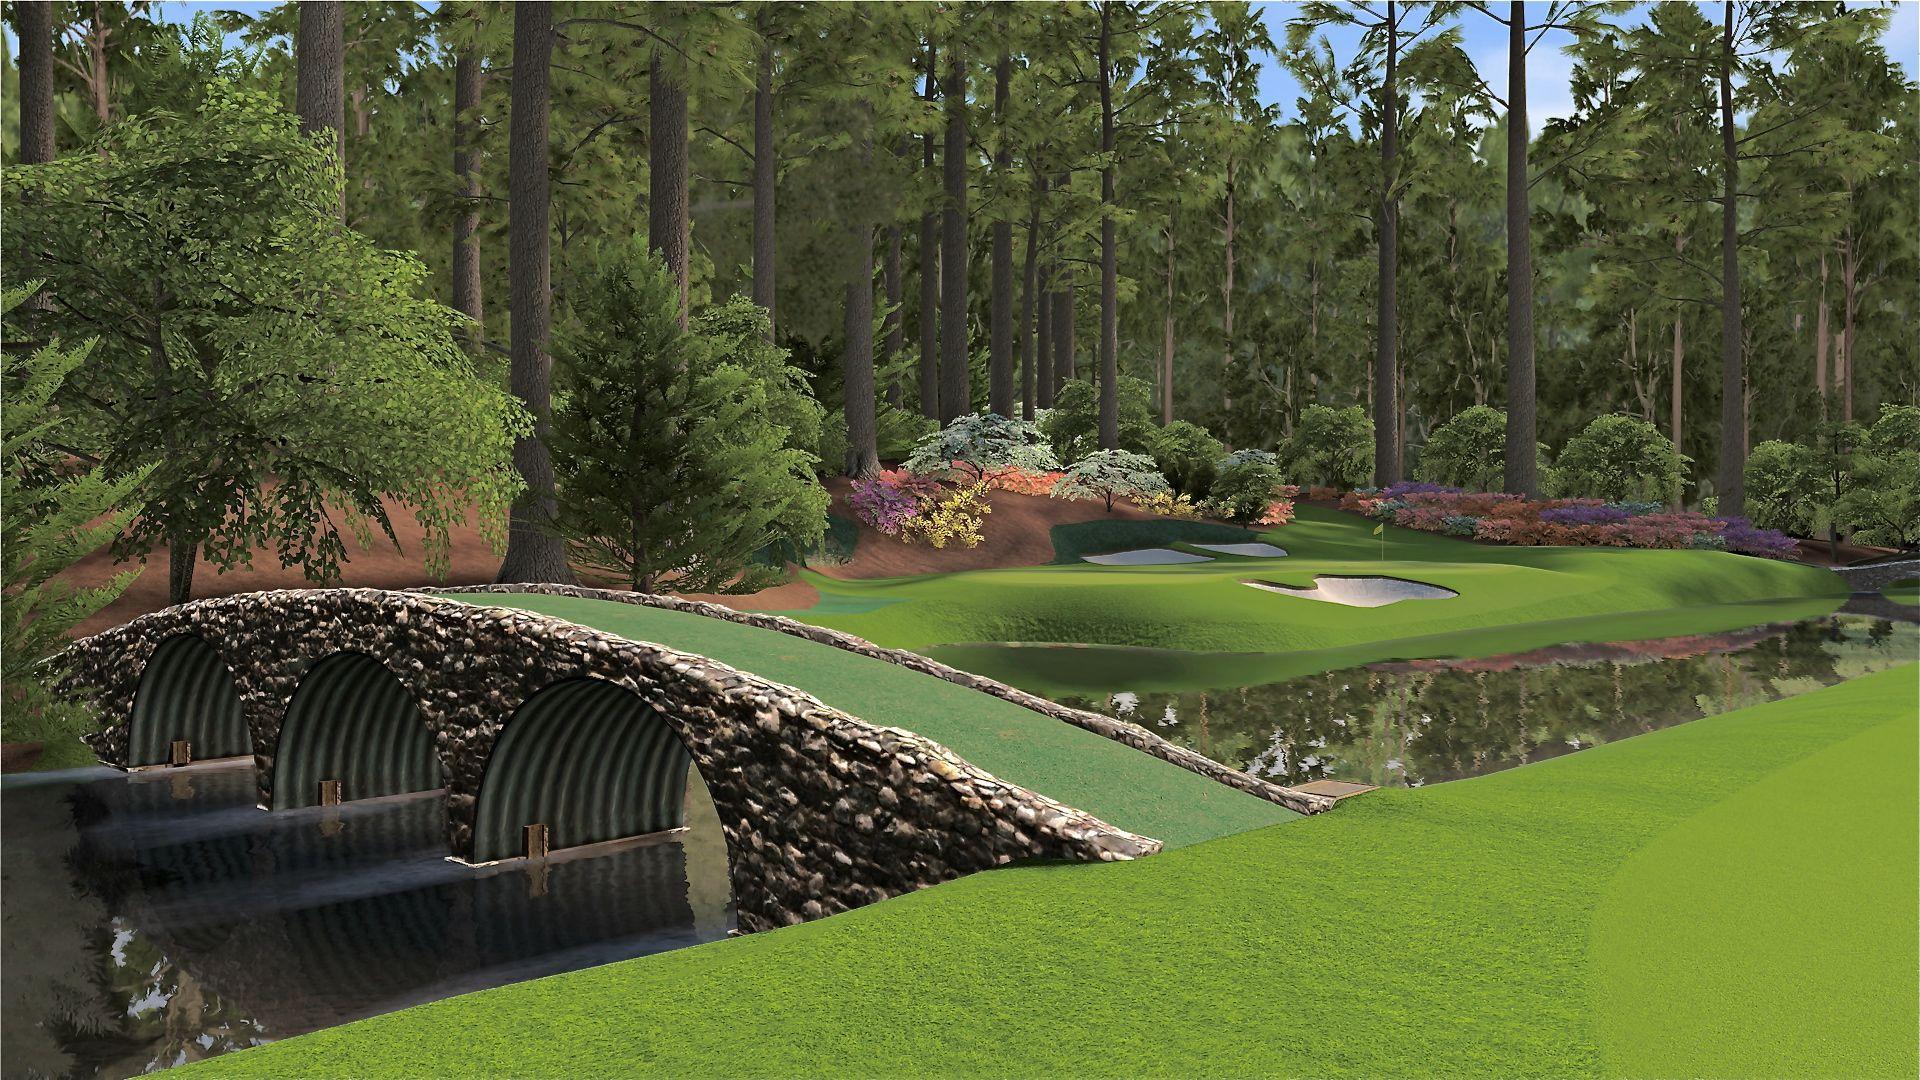 2013 Masters Augusta National GC Augusta national golf